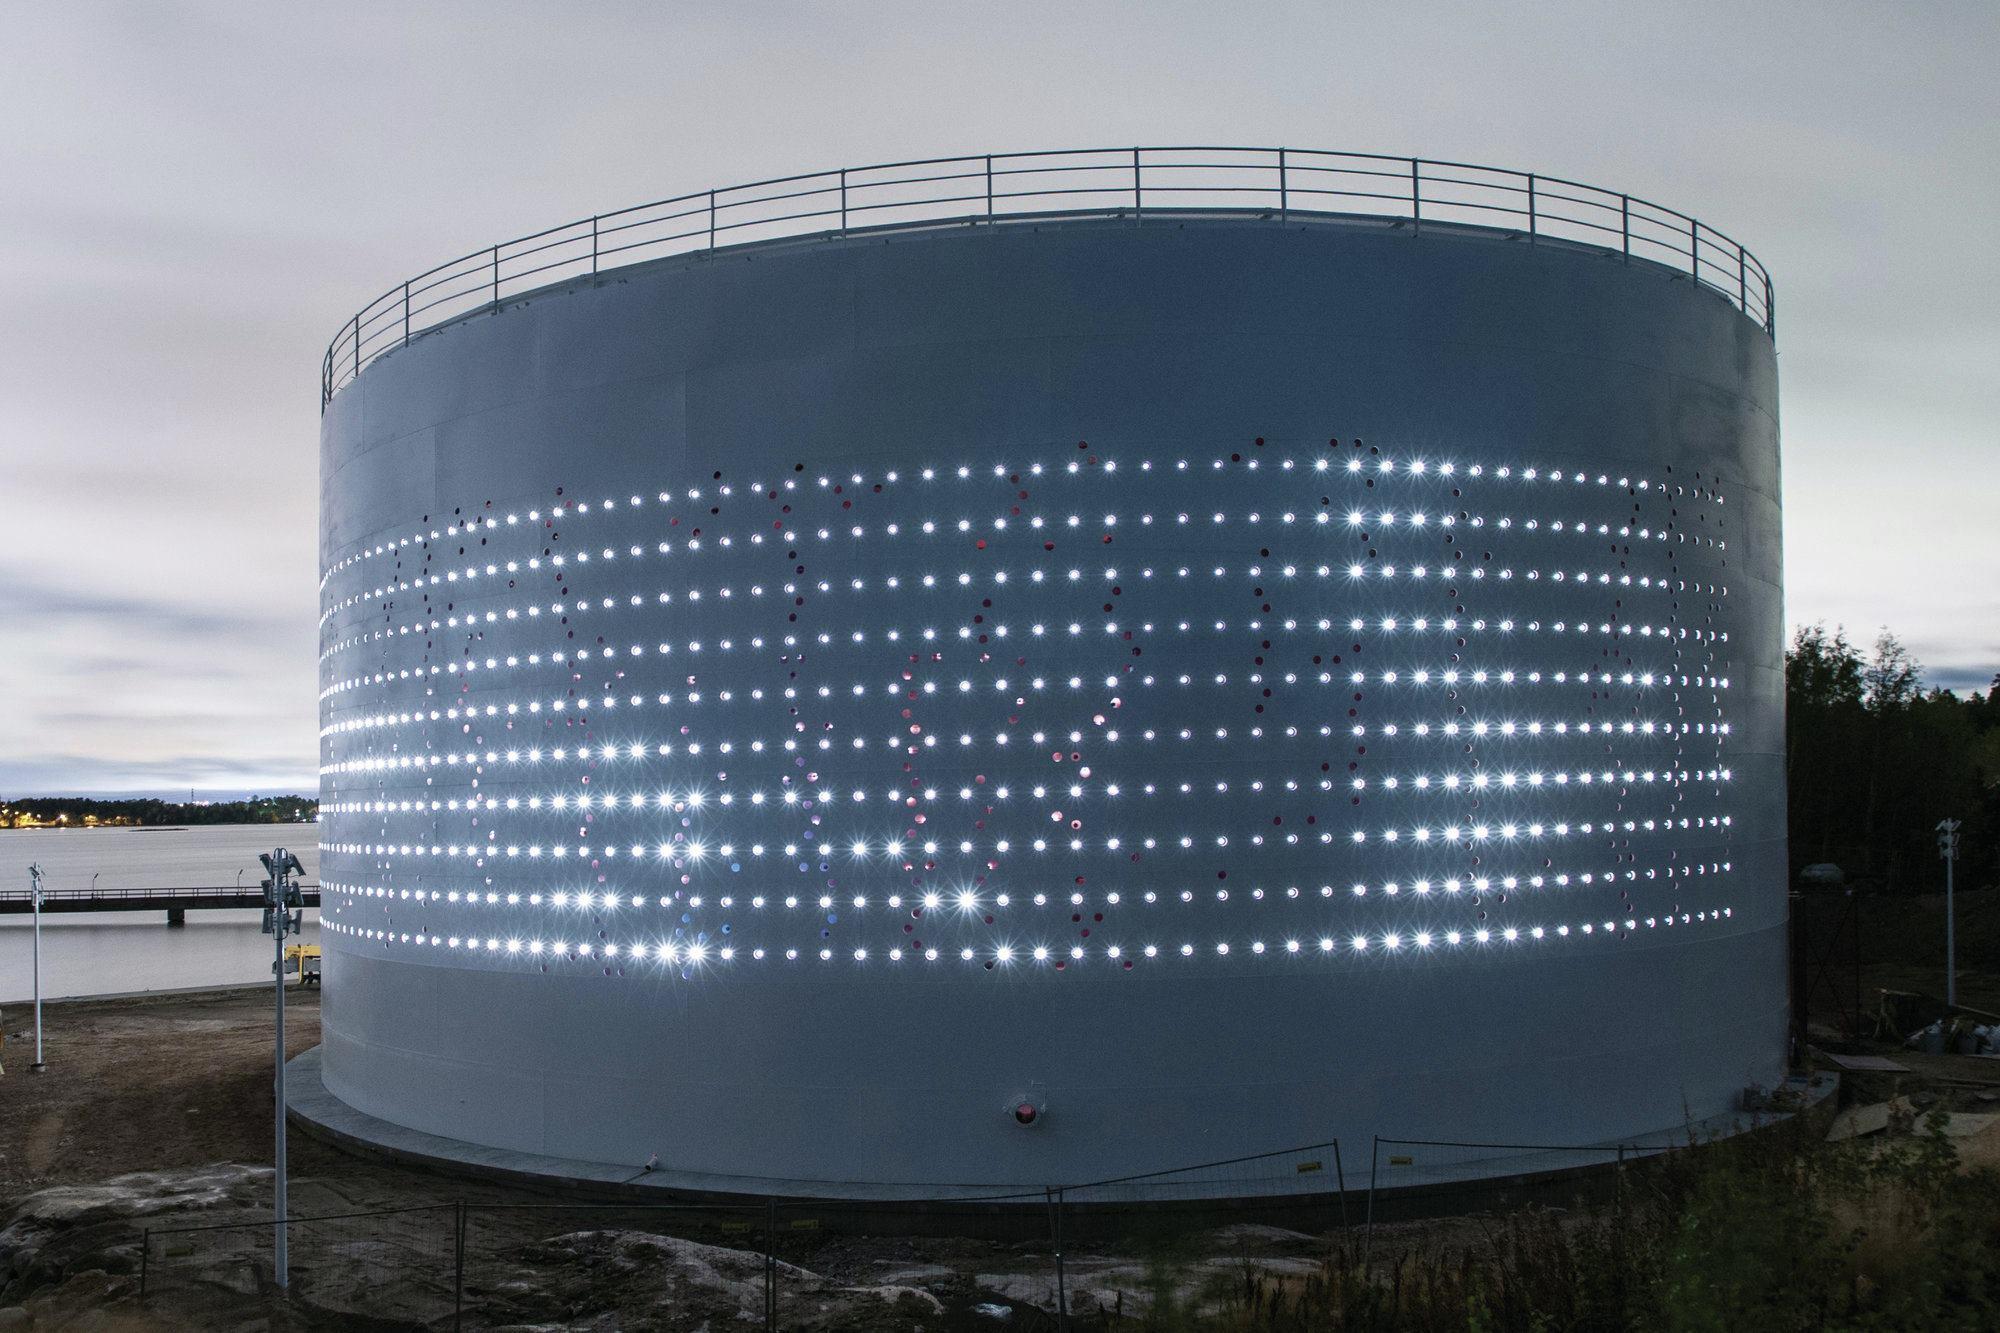 Al design awards silo helsinki architectural lighting